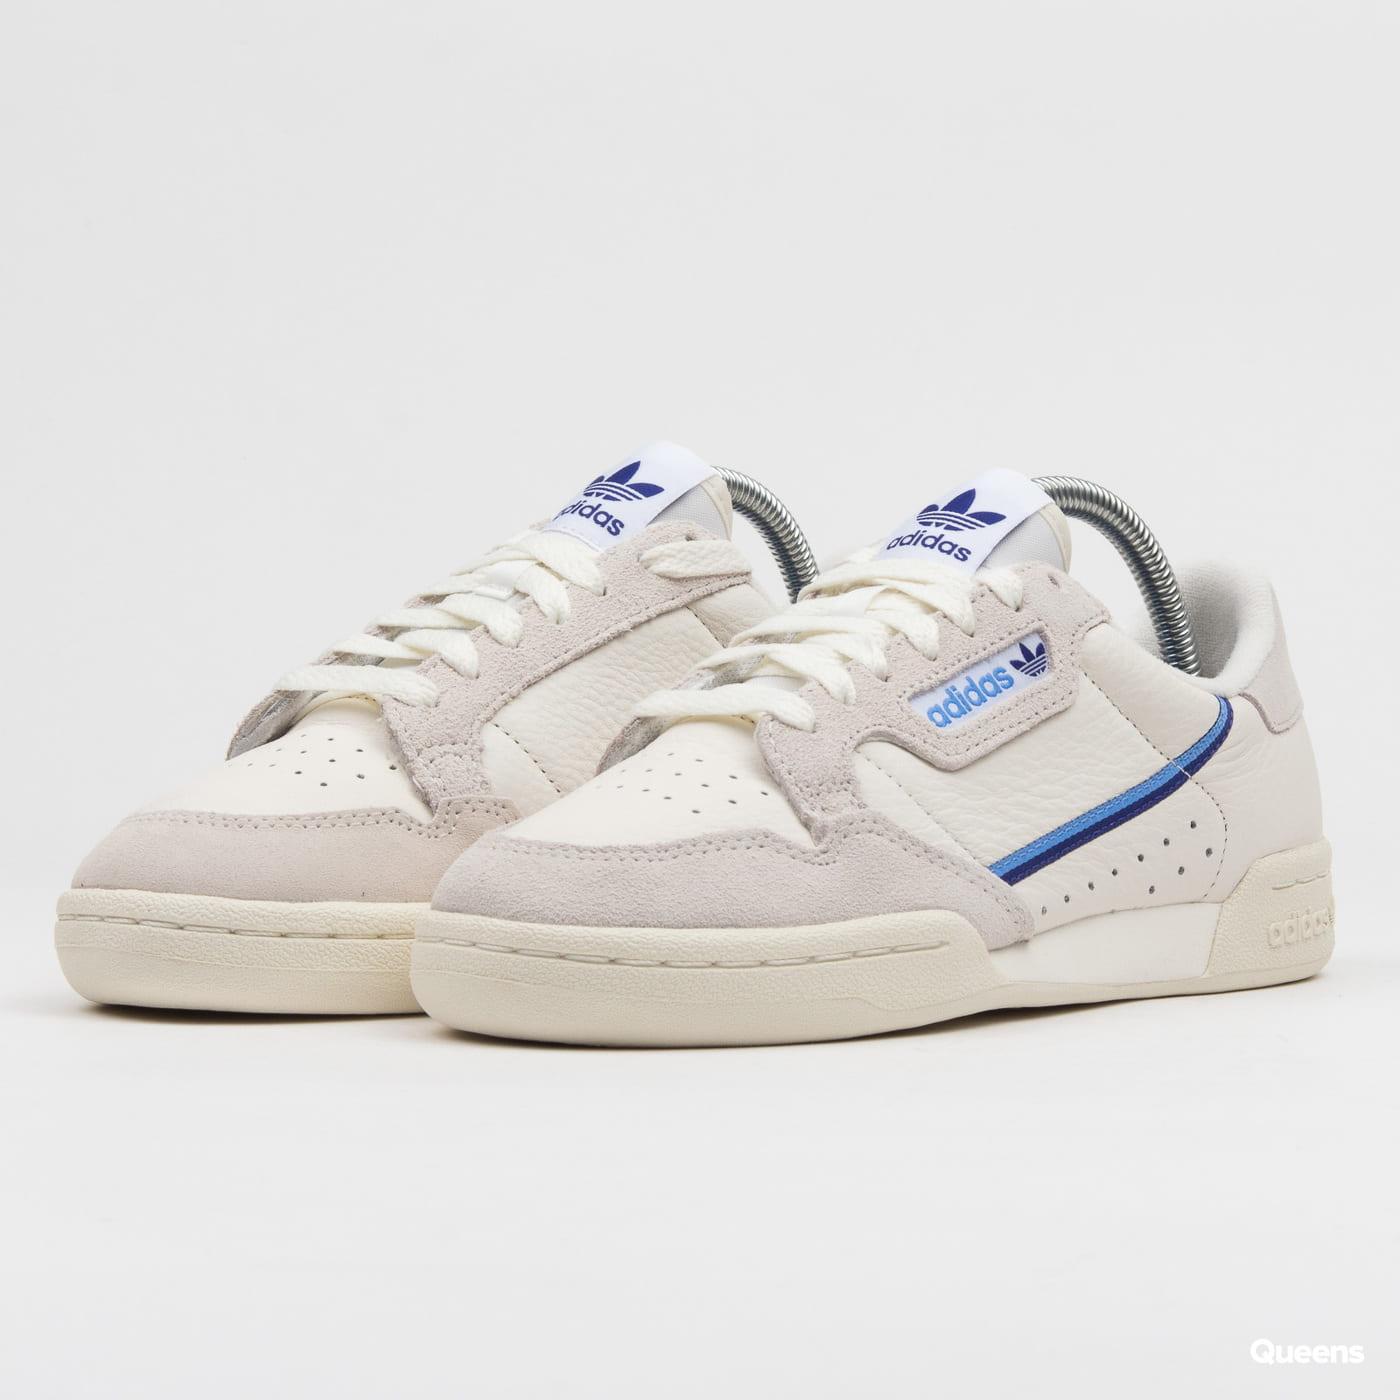 adidas Originals Continental 80 W owhite / clowht / rawwht